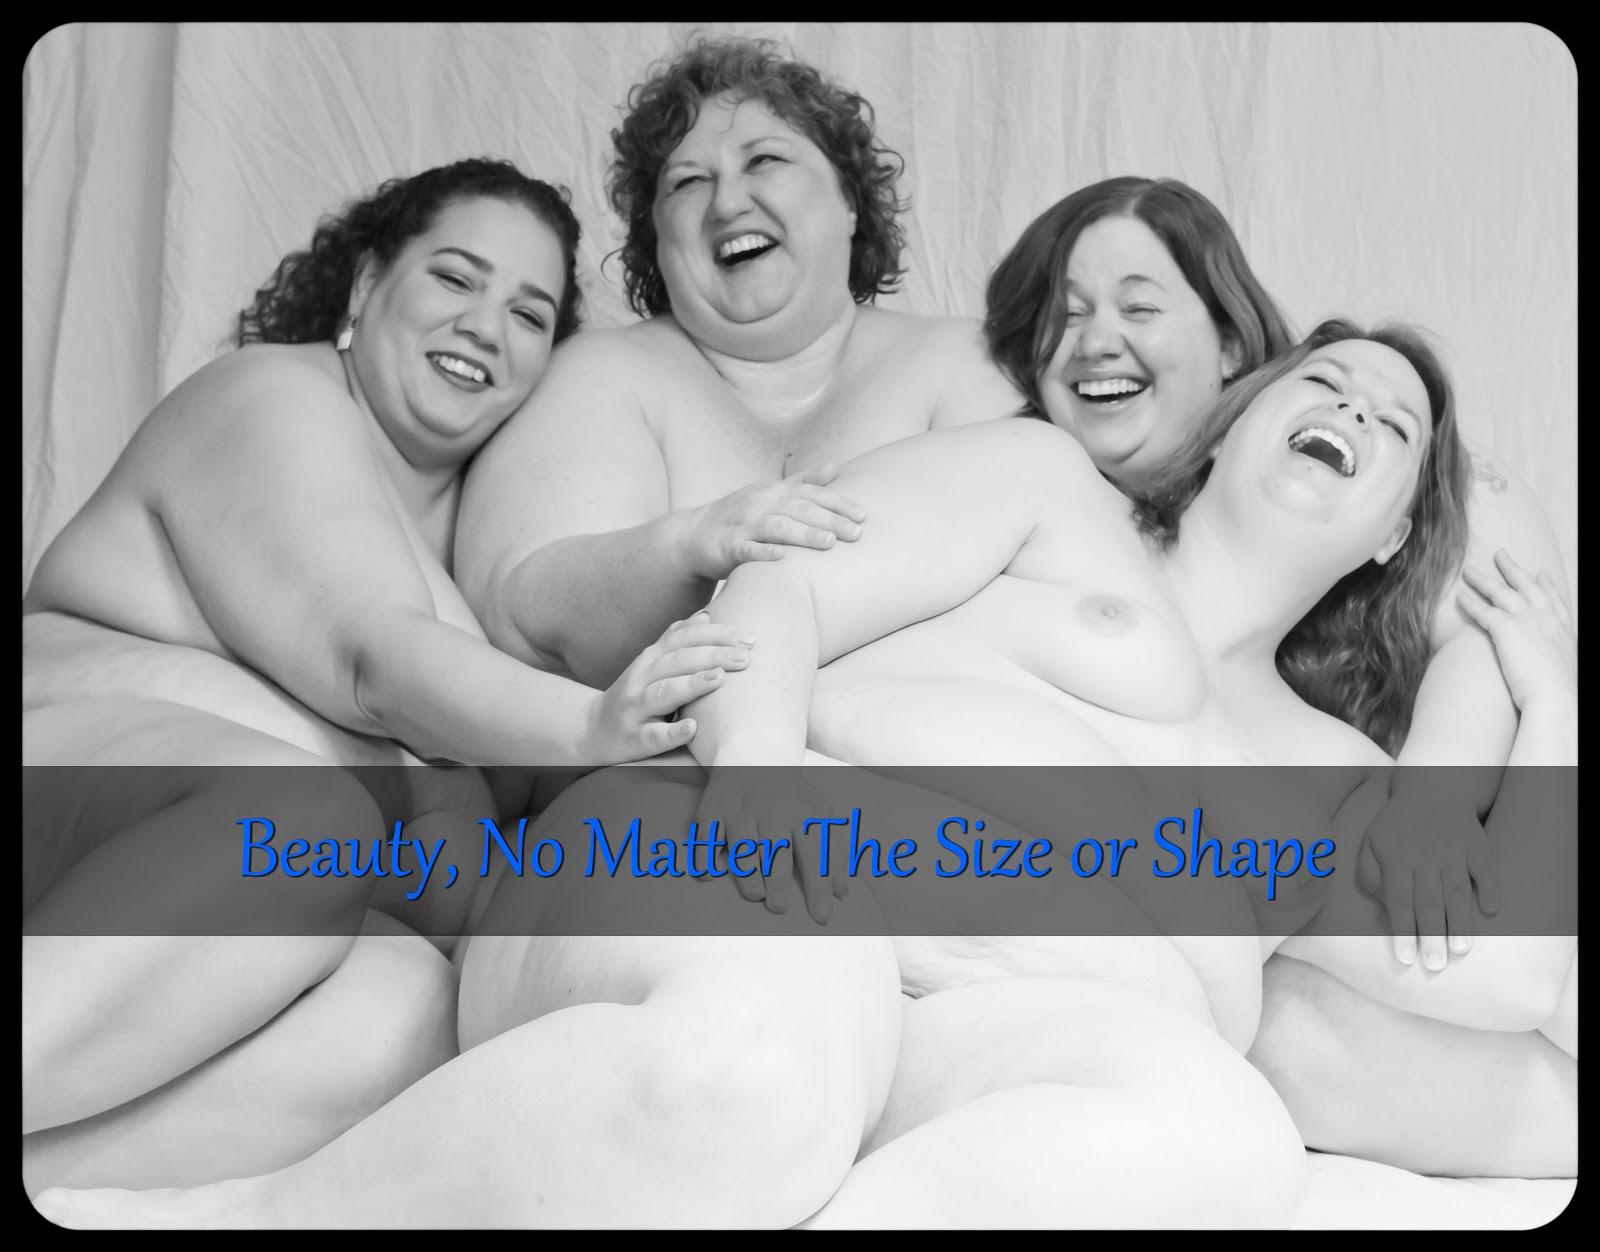 Fette nackte Frau posiert lustig